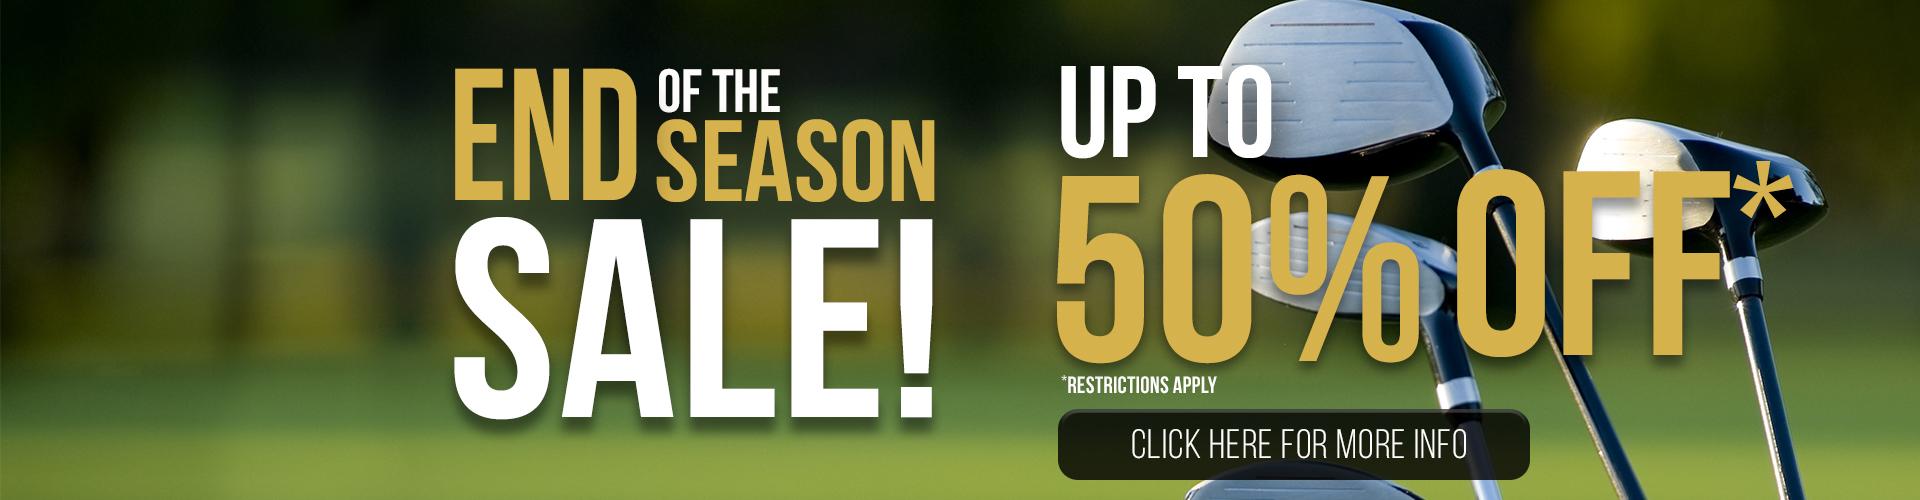 End of the Season Sale!